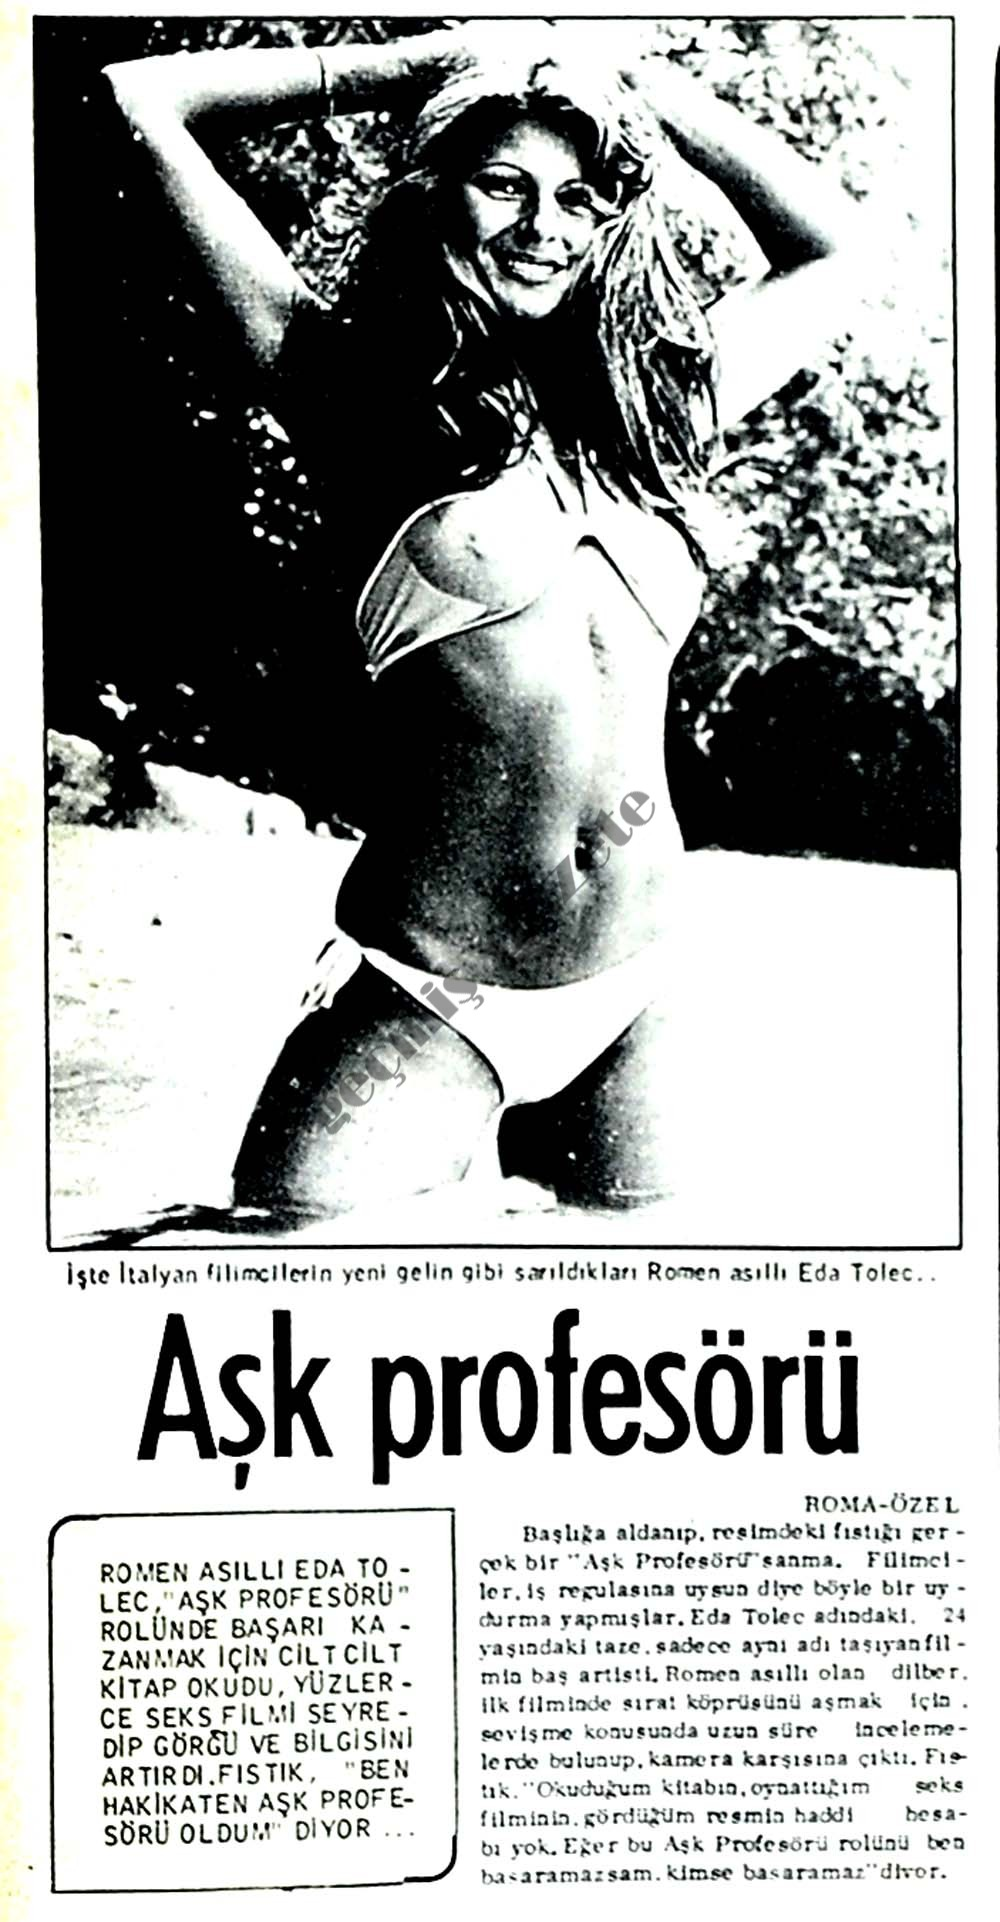 Aşk profesörü